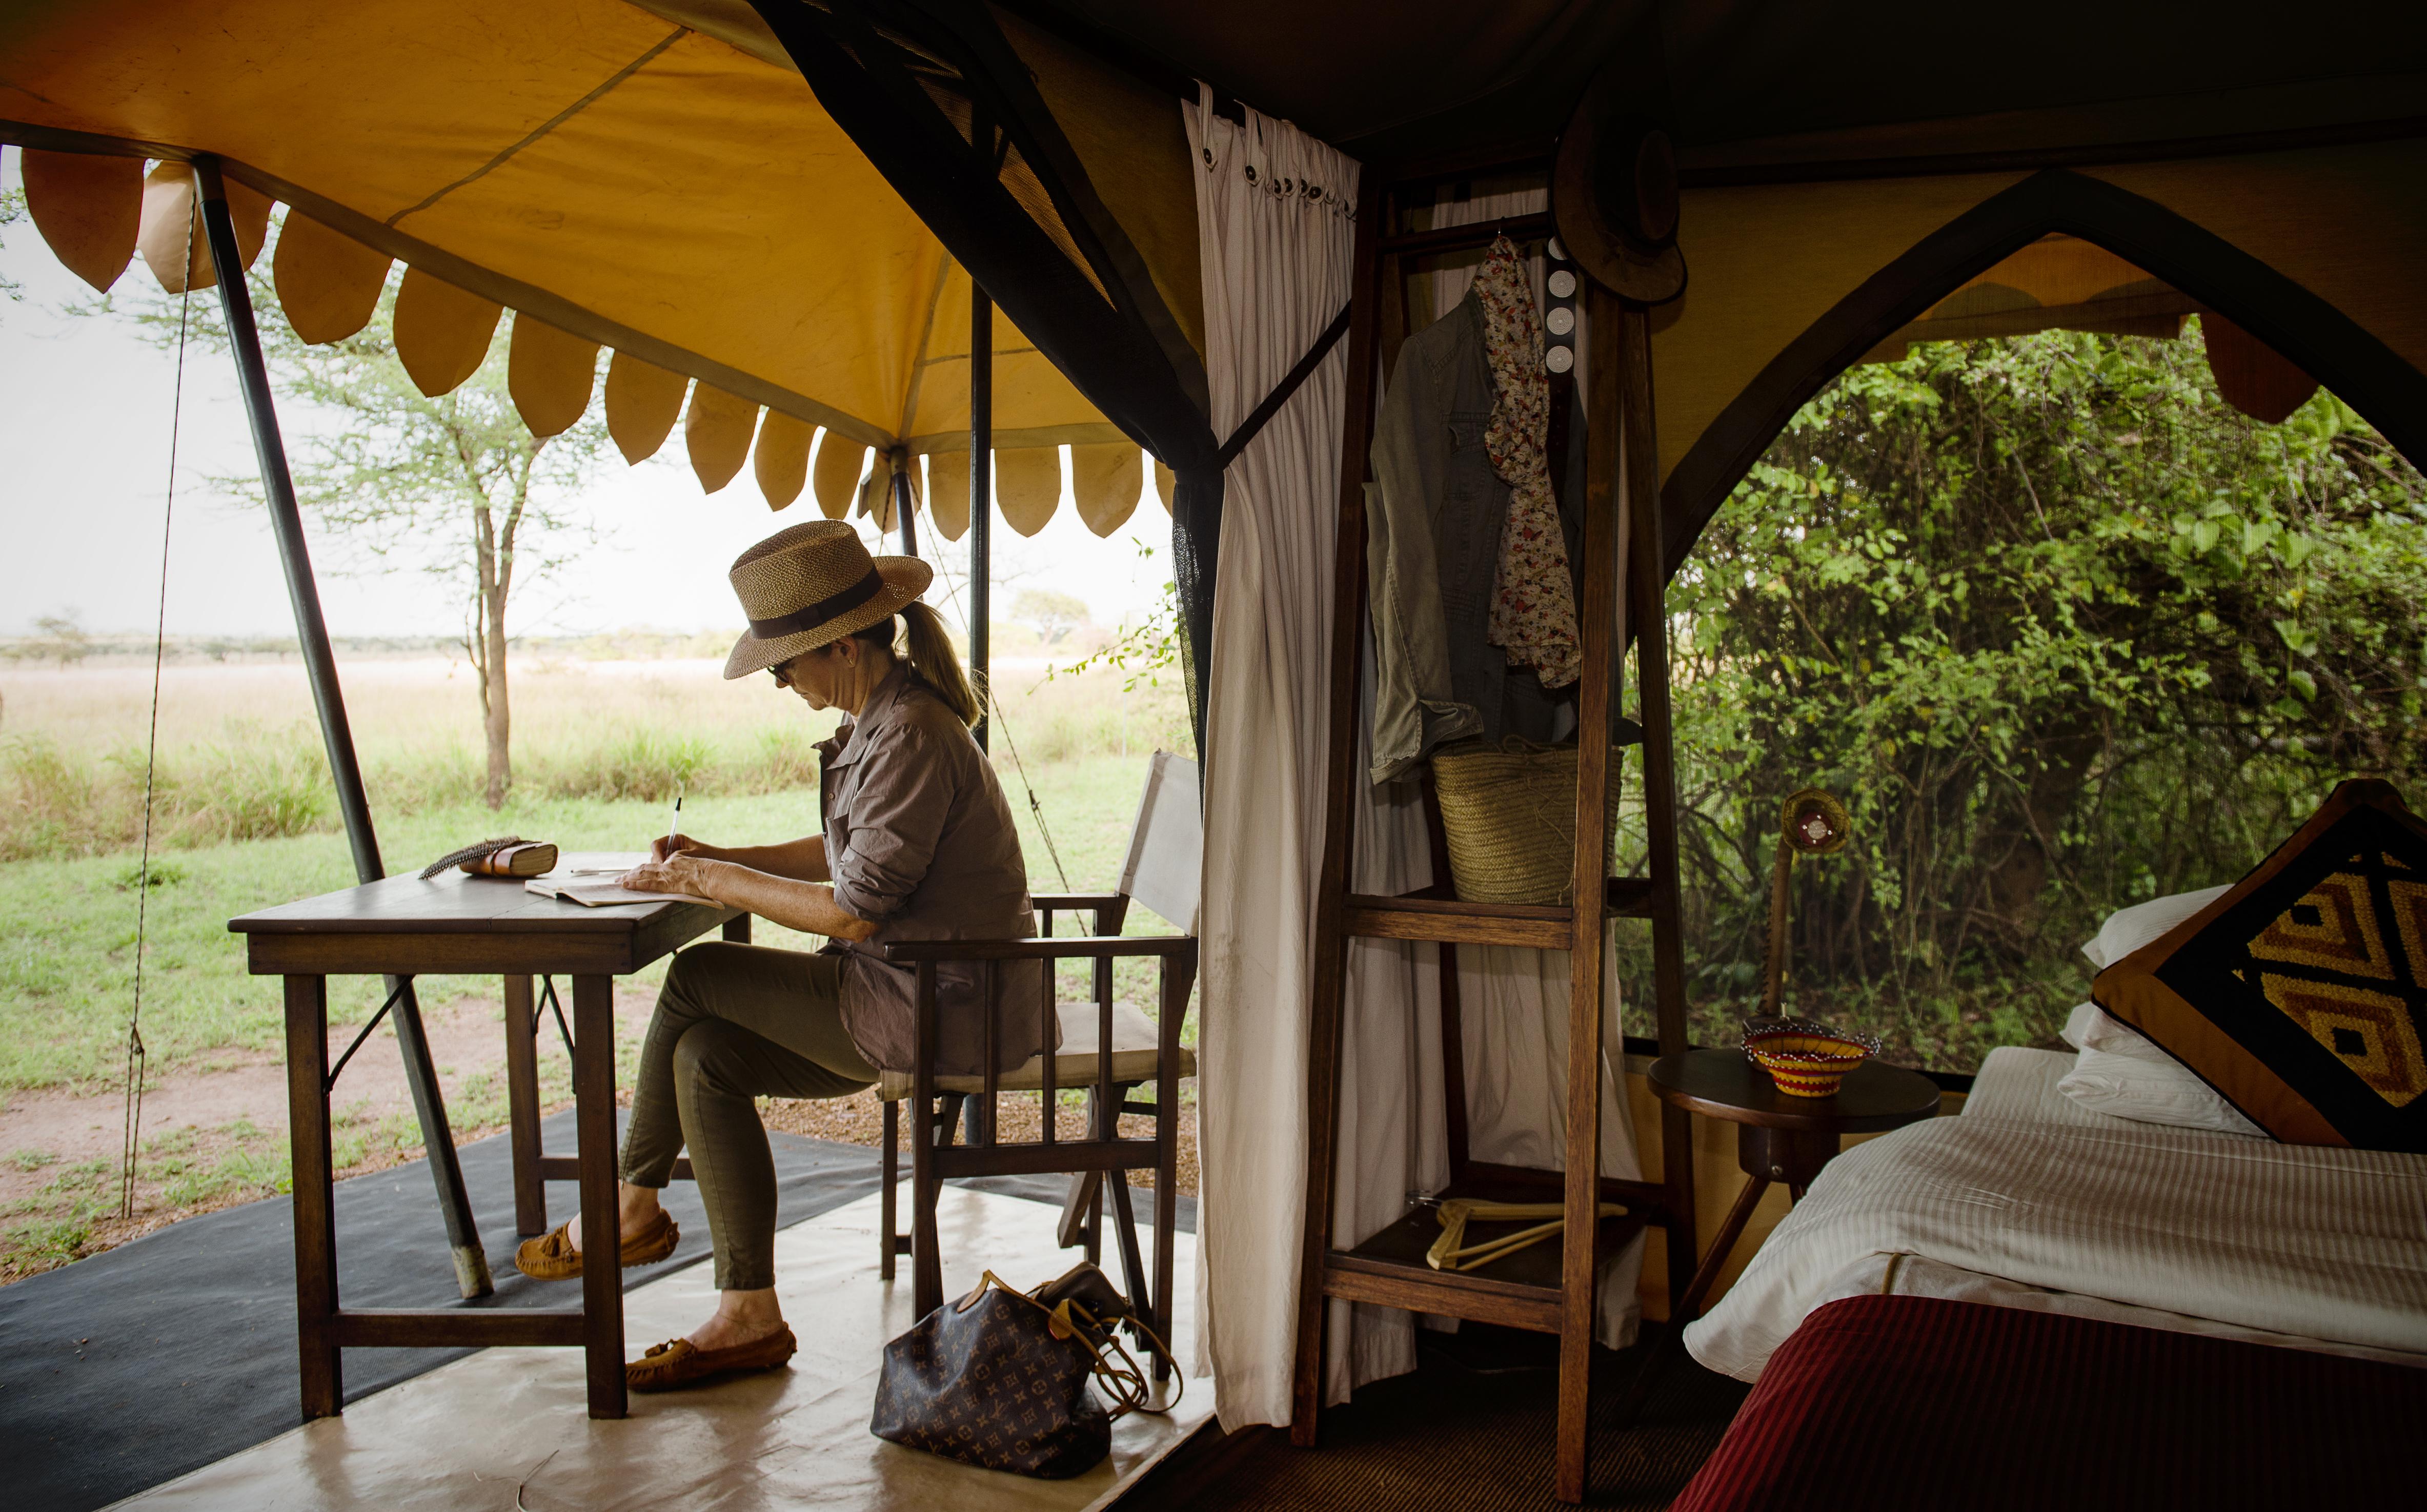 Journal writing on safari with AdventureWomen, a female-run tour company for women travelers.